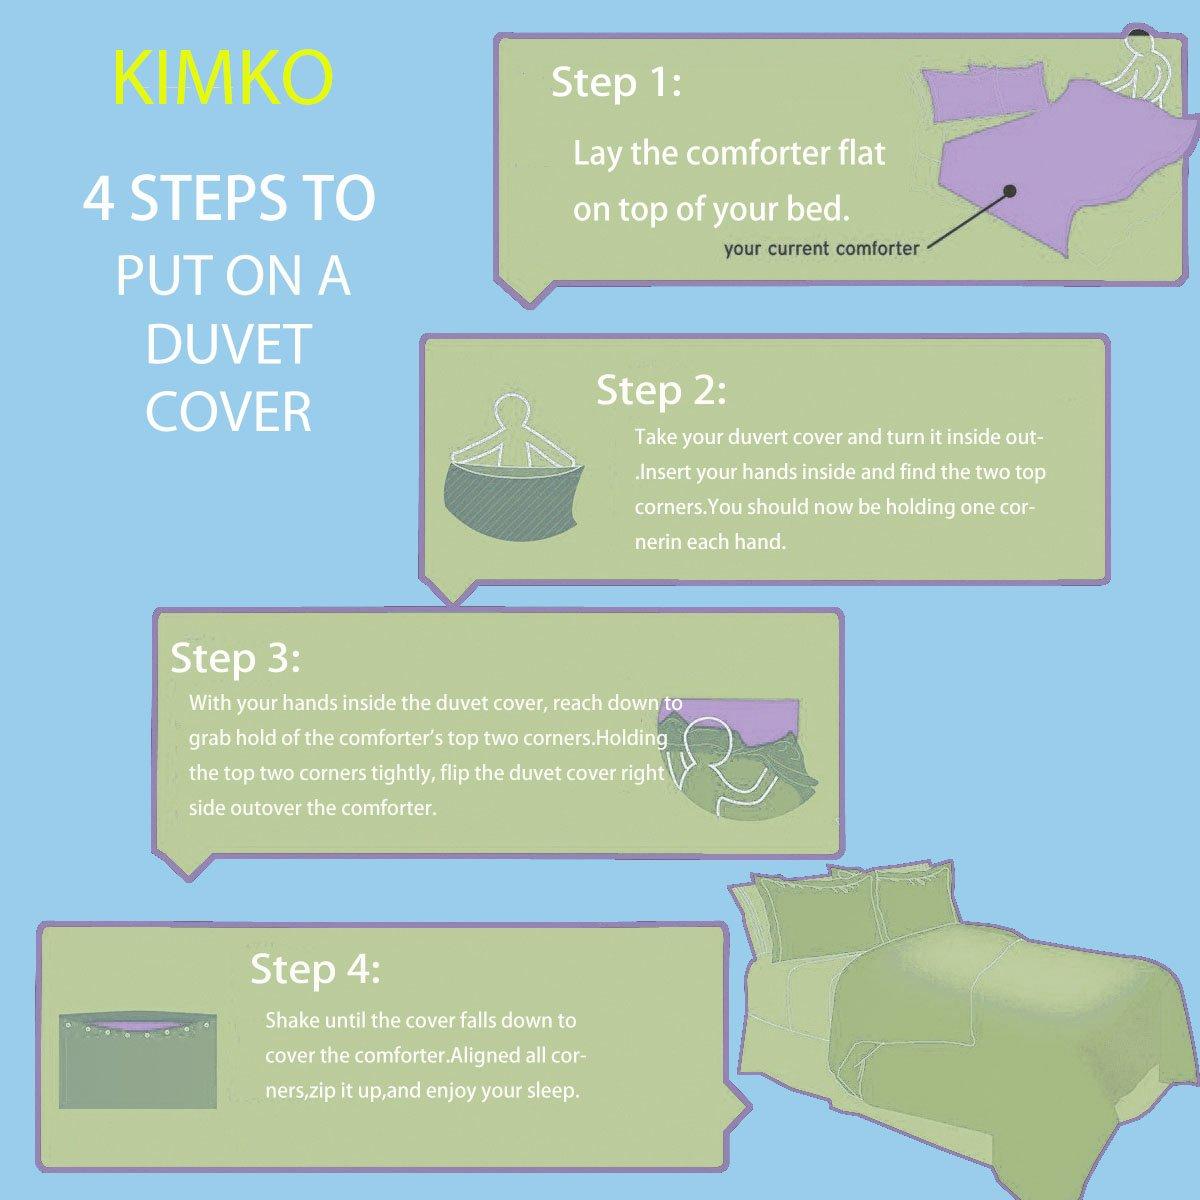 Kimko Kids Crown Bedding Set- Girls Reversible Crown of The Plaid Pattern Blue&White Cover -4Pcs -1 Duvet Cover Set + 1 Flat Sheet + 2 Pillowcases